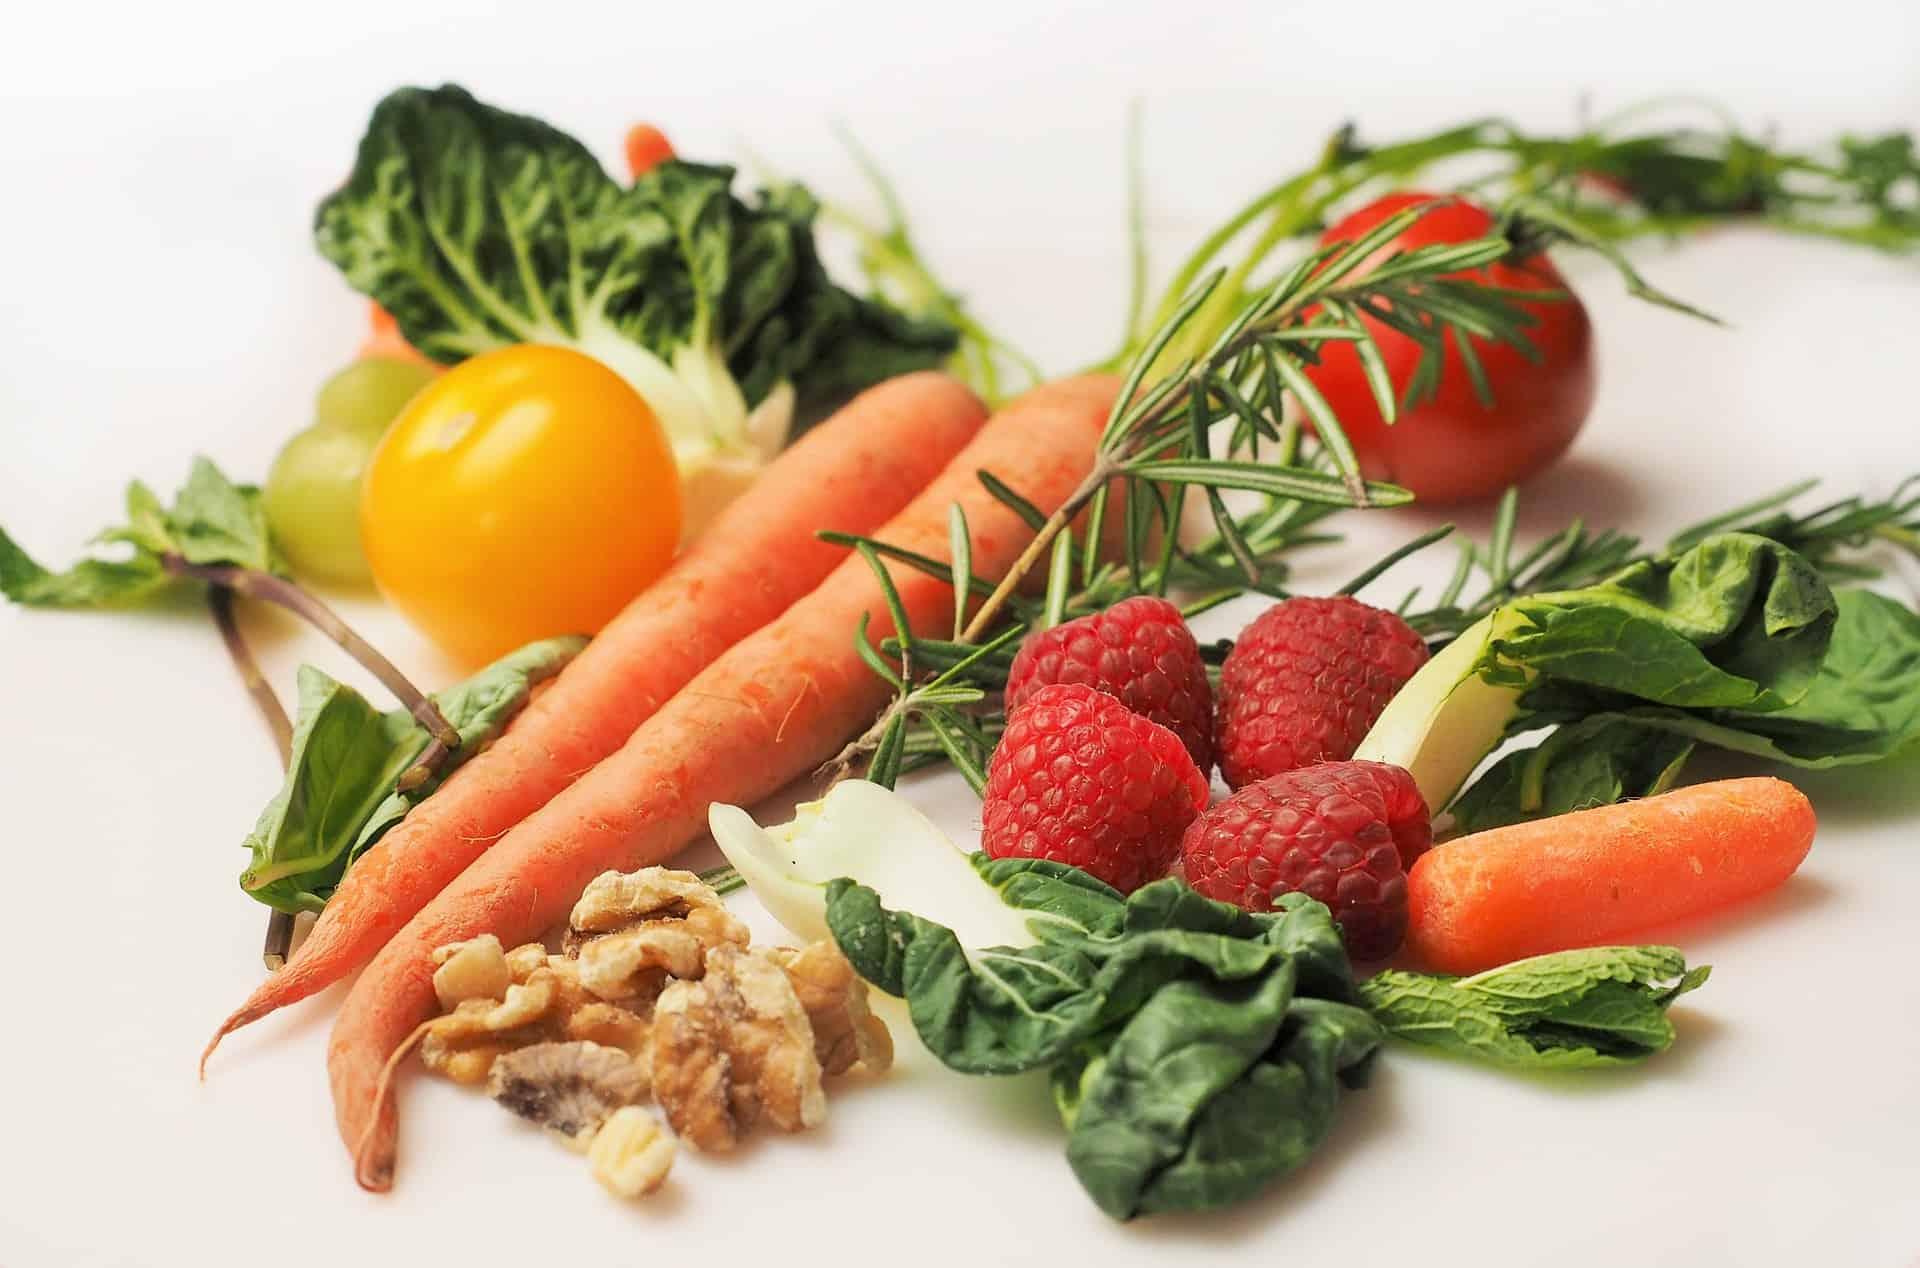 Entzündungshemmende Lebensmittel: Tipps und leckere Rezepte